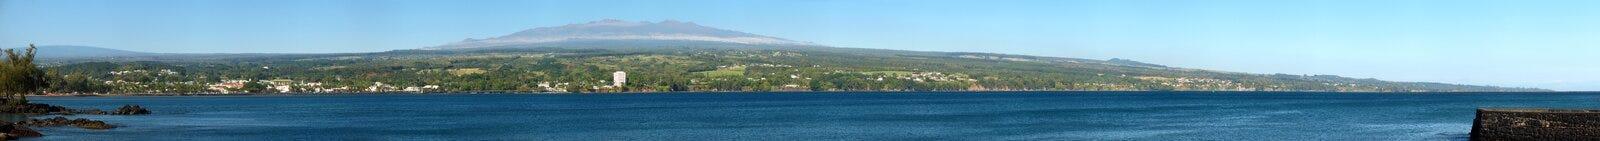 Panorama de Mauna Kea Image libre de droits